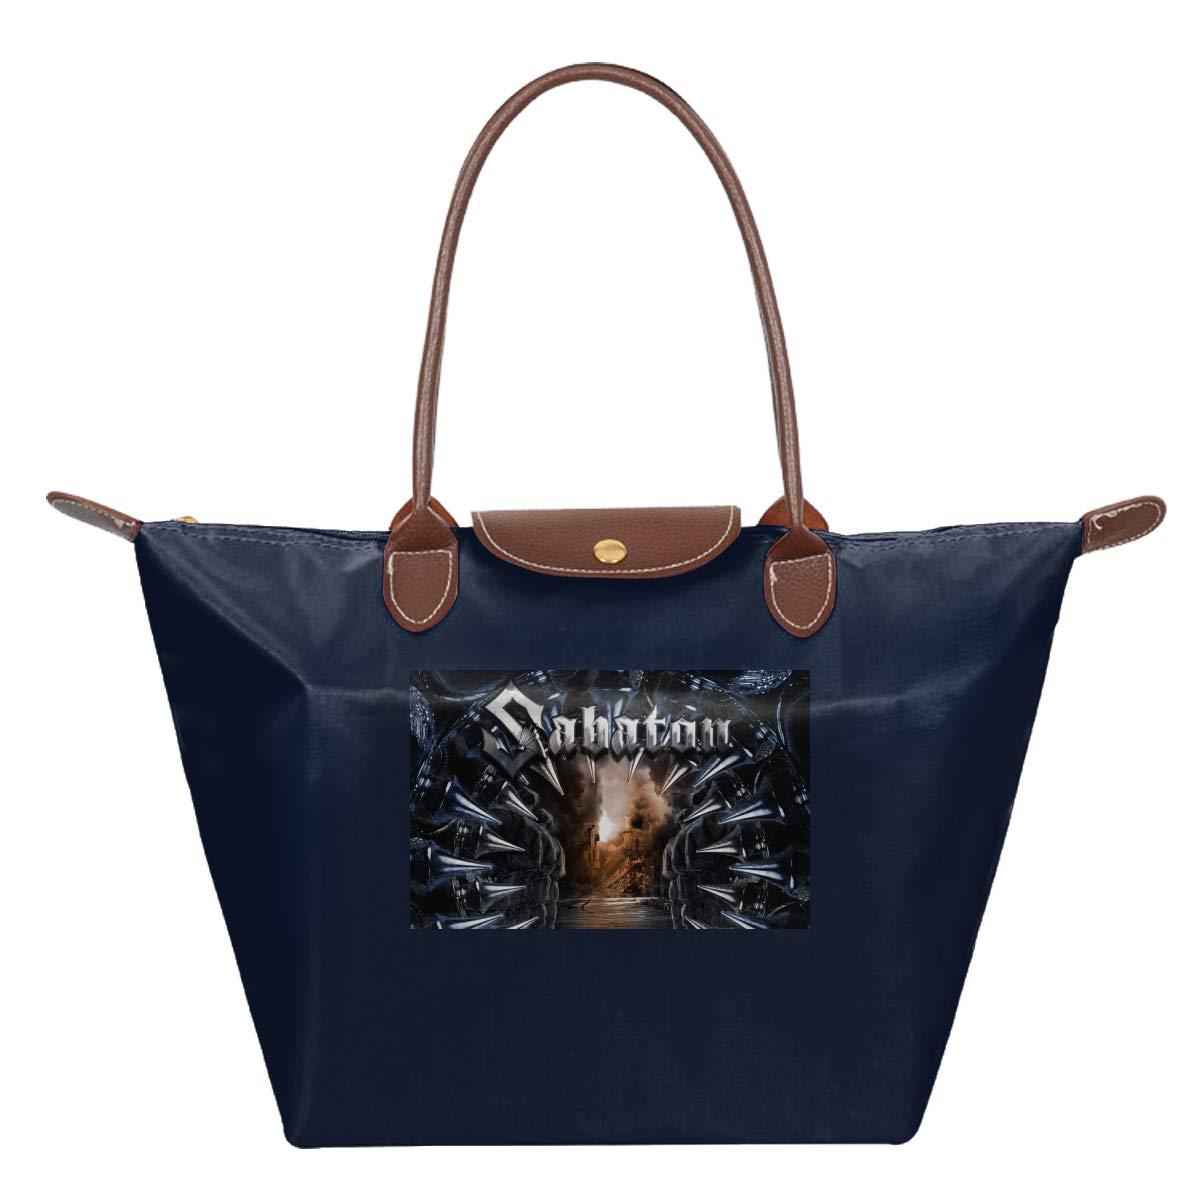 Sabaton Attero Dominatus Waterproof Leather Folded Messenger Nylon Bag Travel Tote Hopping Folding School Handbags